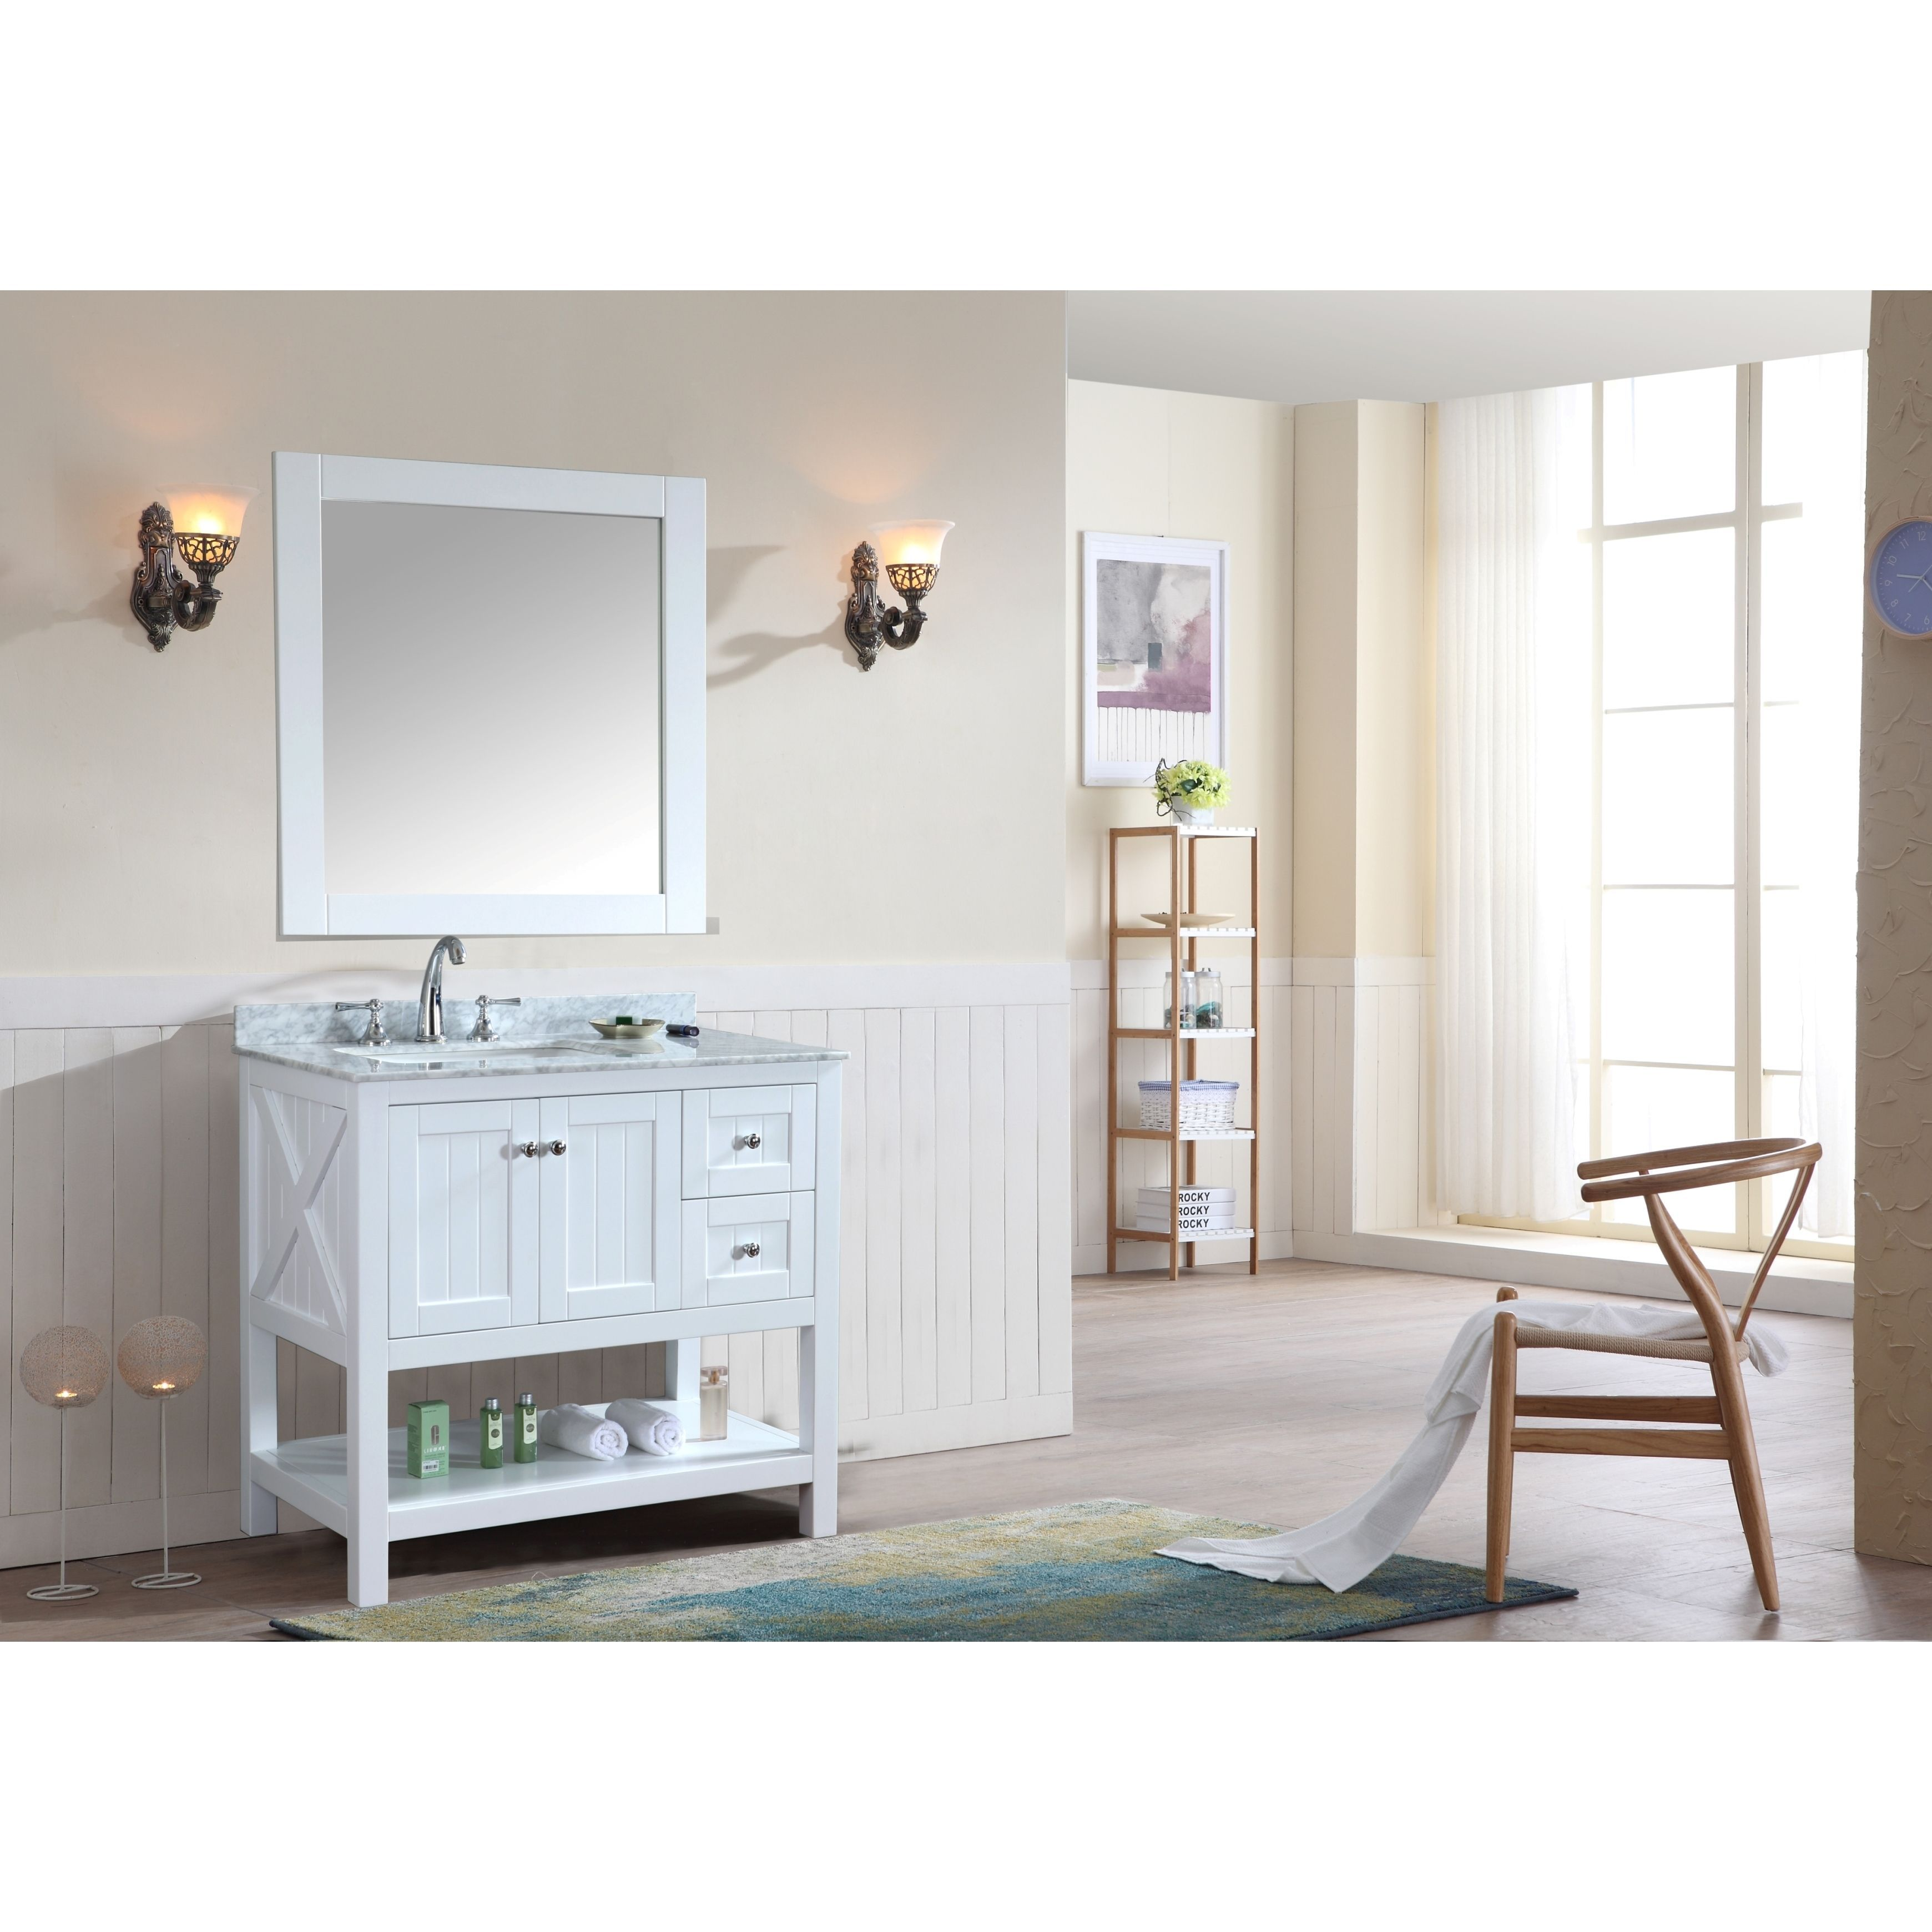 Kitchen And Bathroom Ari Kitchen And Bath Emily White 36 Inch Single Bathroom Vanity